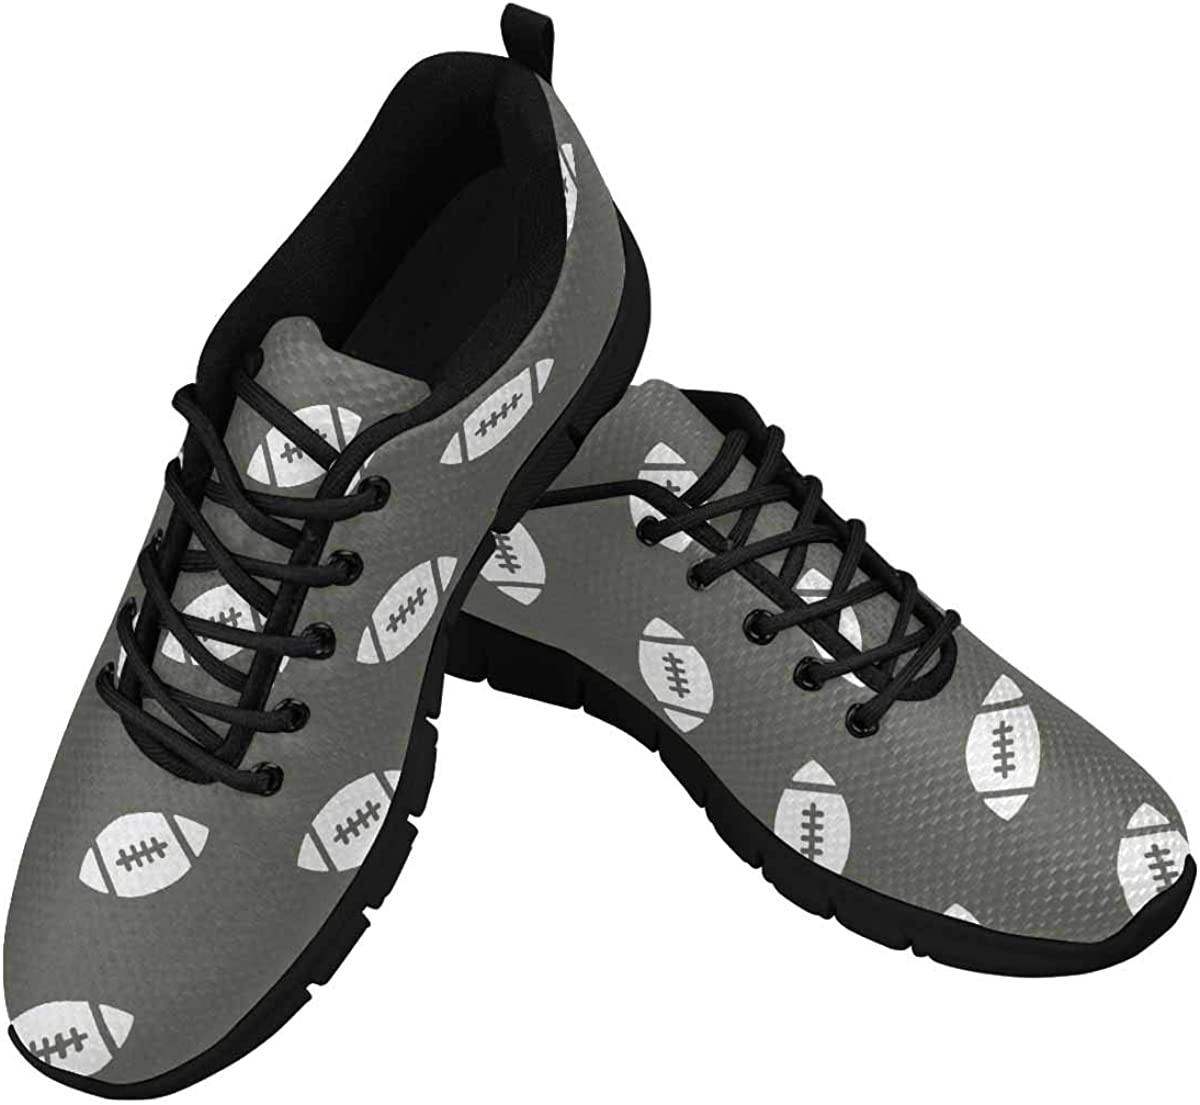 INTERESTPRINT American Football Grey Women's Athletic Mesh Breathable Casual Sneakers